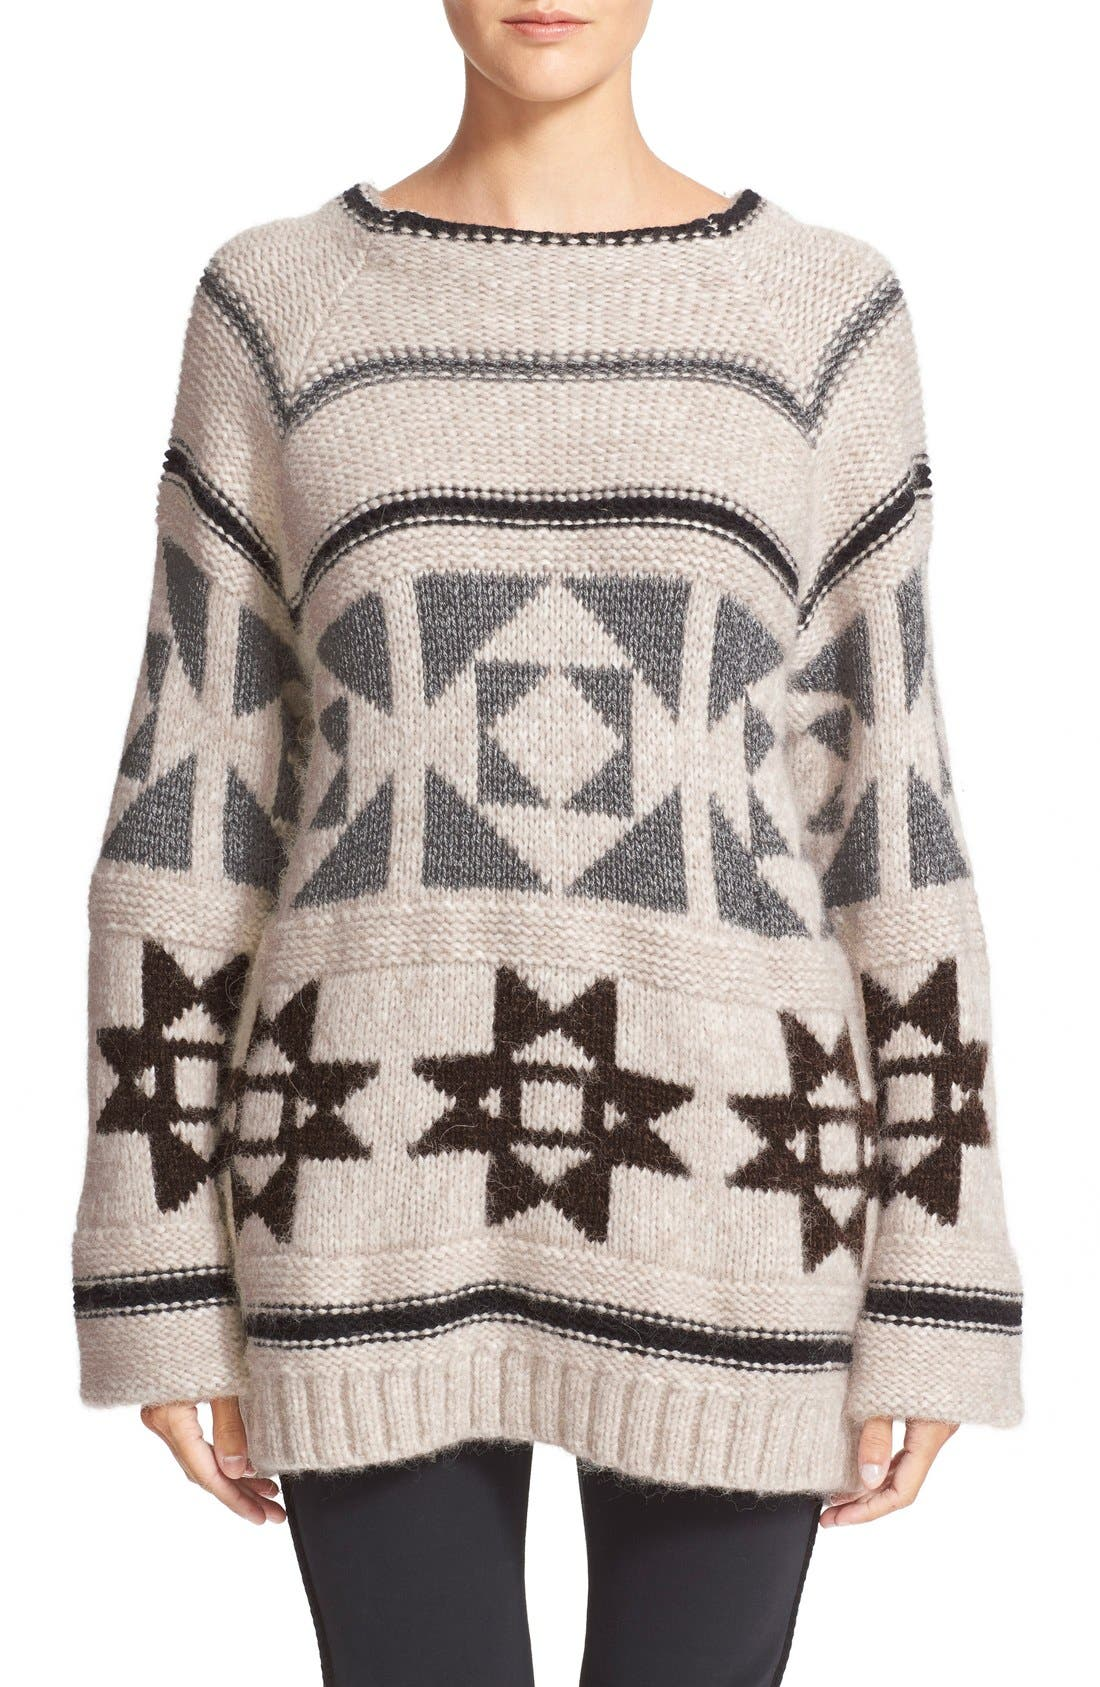 Main Image - Loma'Raine' Alpaca BlendSweater